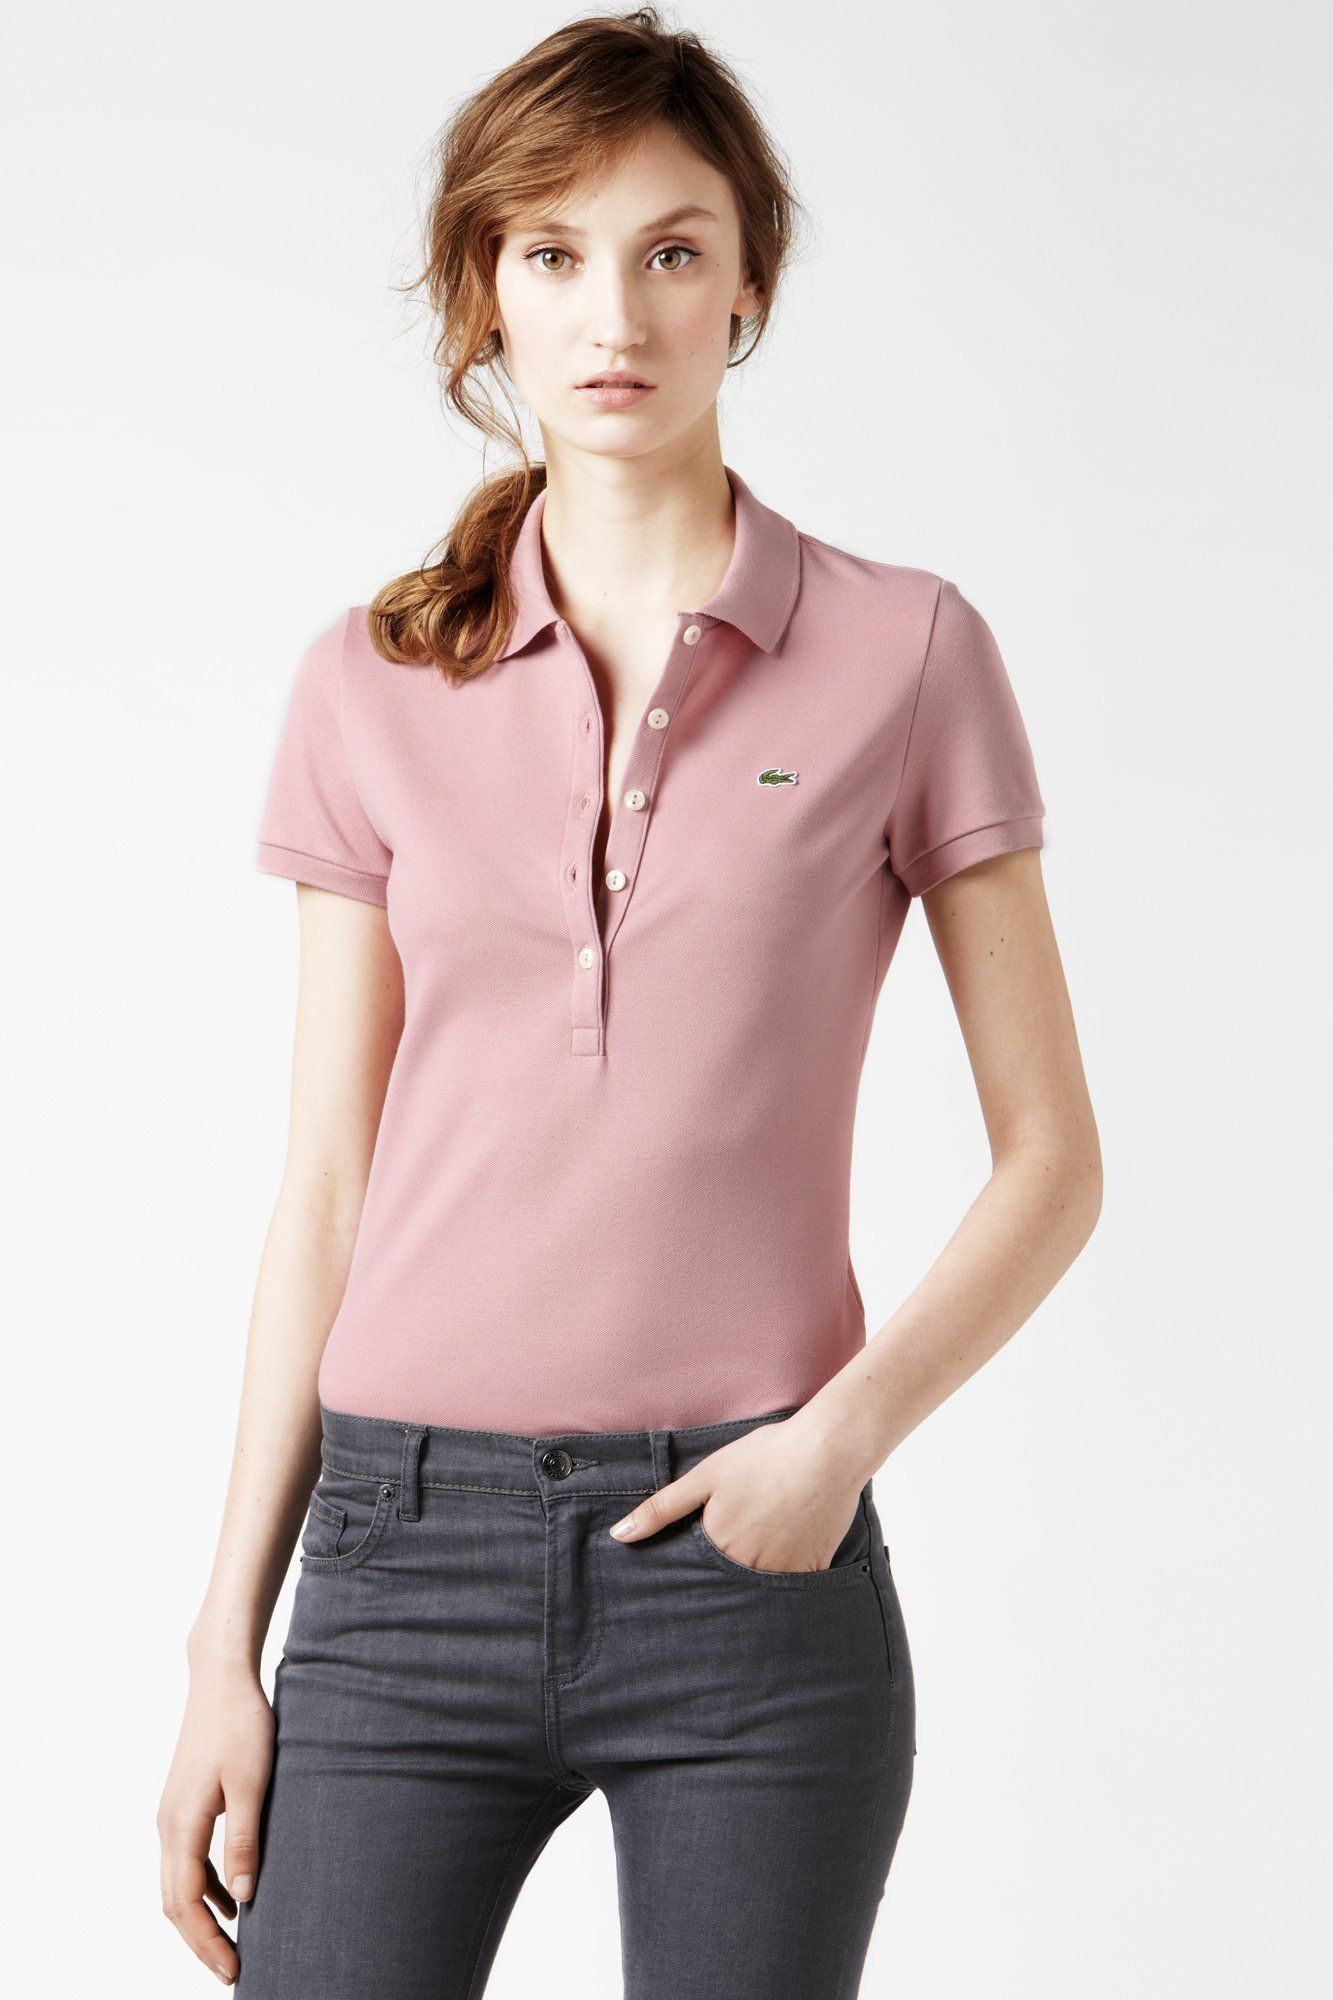 Pique Polo Fit Short Lacoste Sleeve Stretch Slim srdQxthC